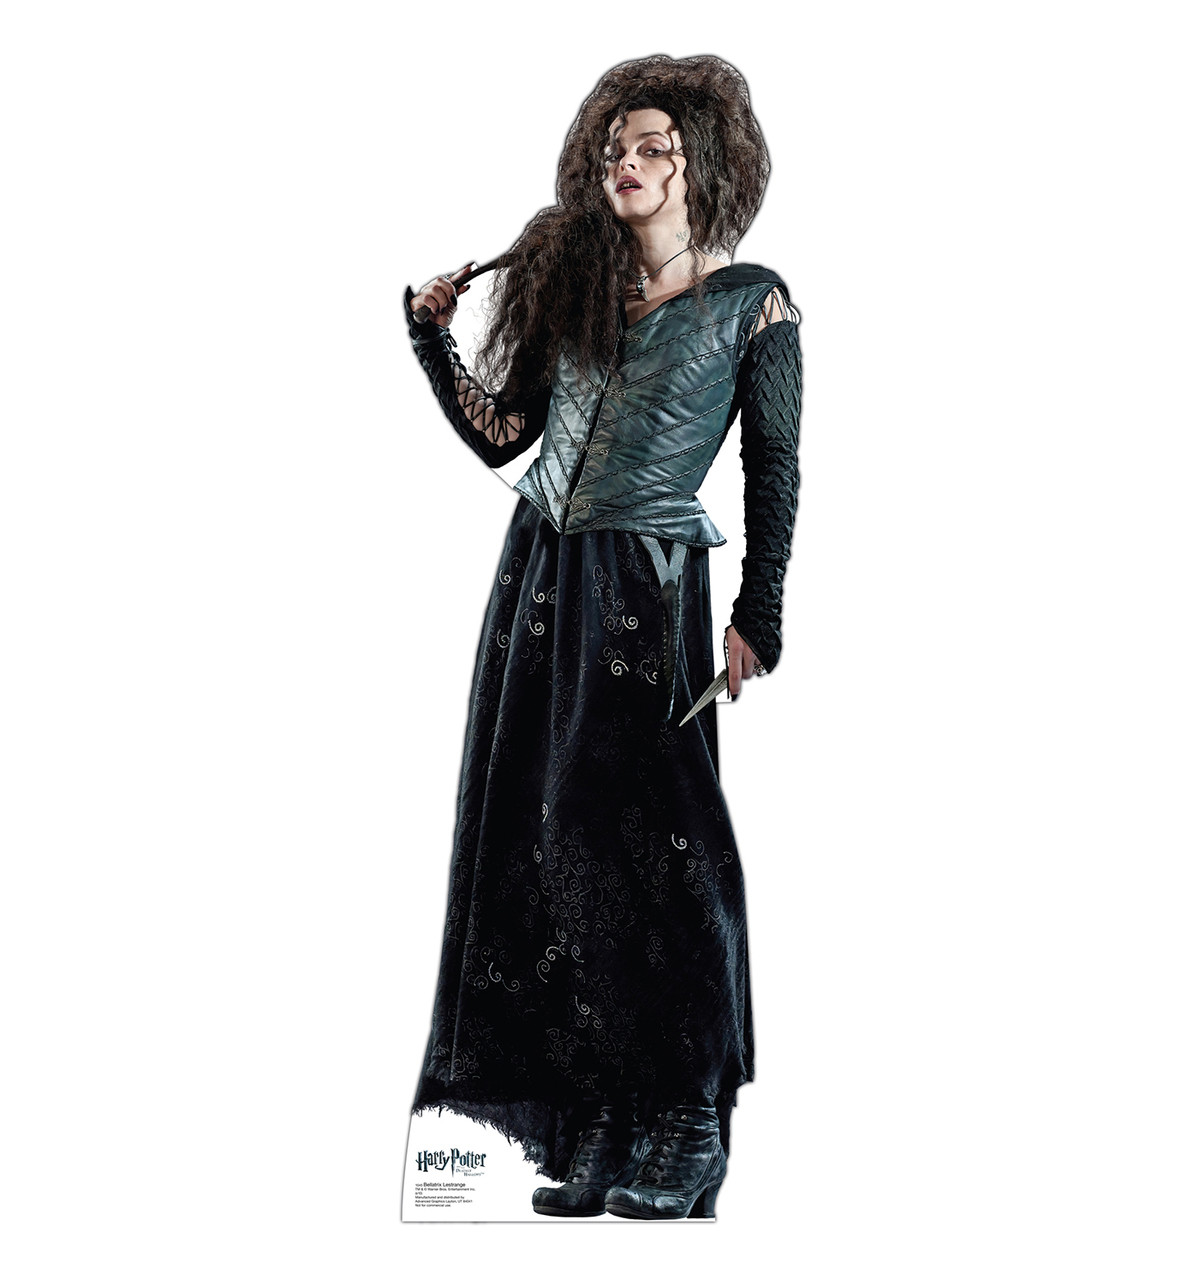 Life-size Bellatrix Lestrange Cardboard Standup   Cardboard Cutout